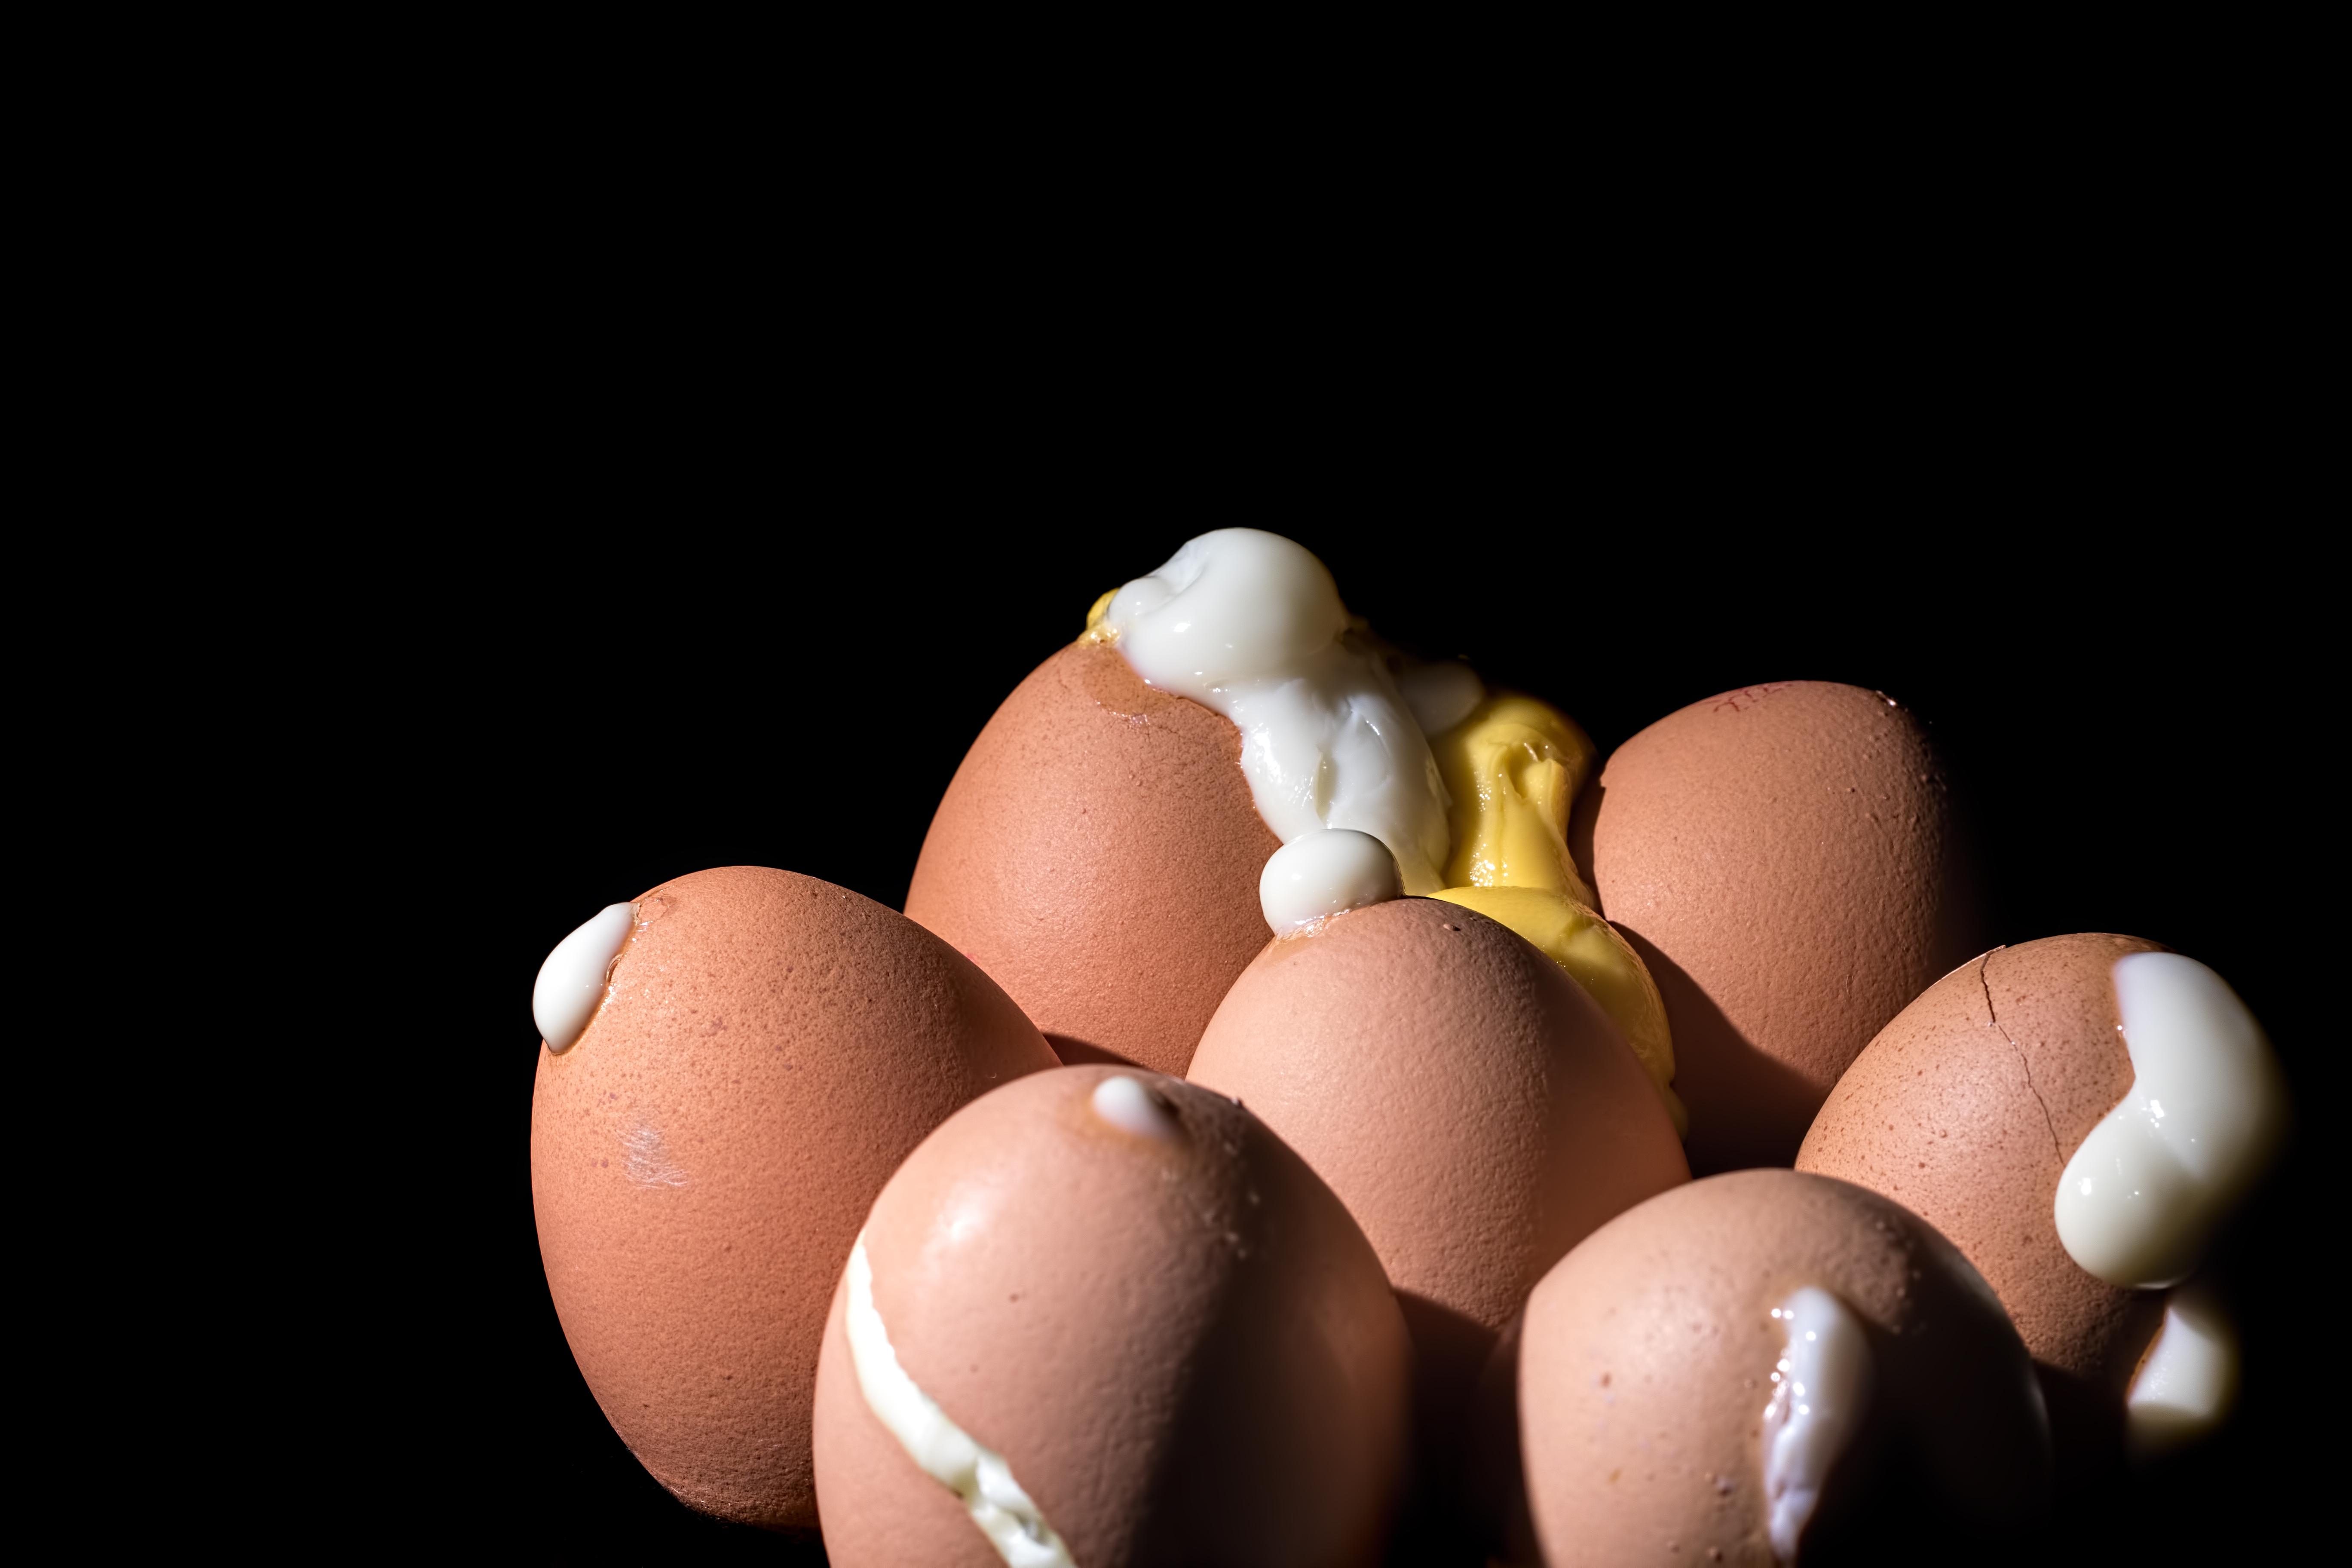 How to avoid cracked hard-boiled eggs